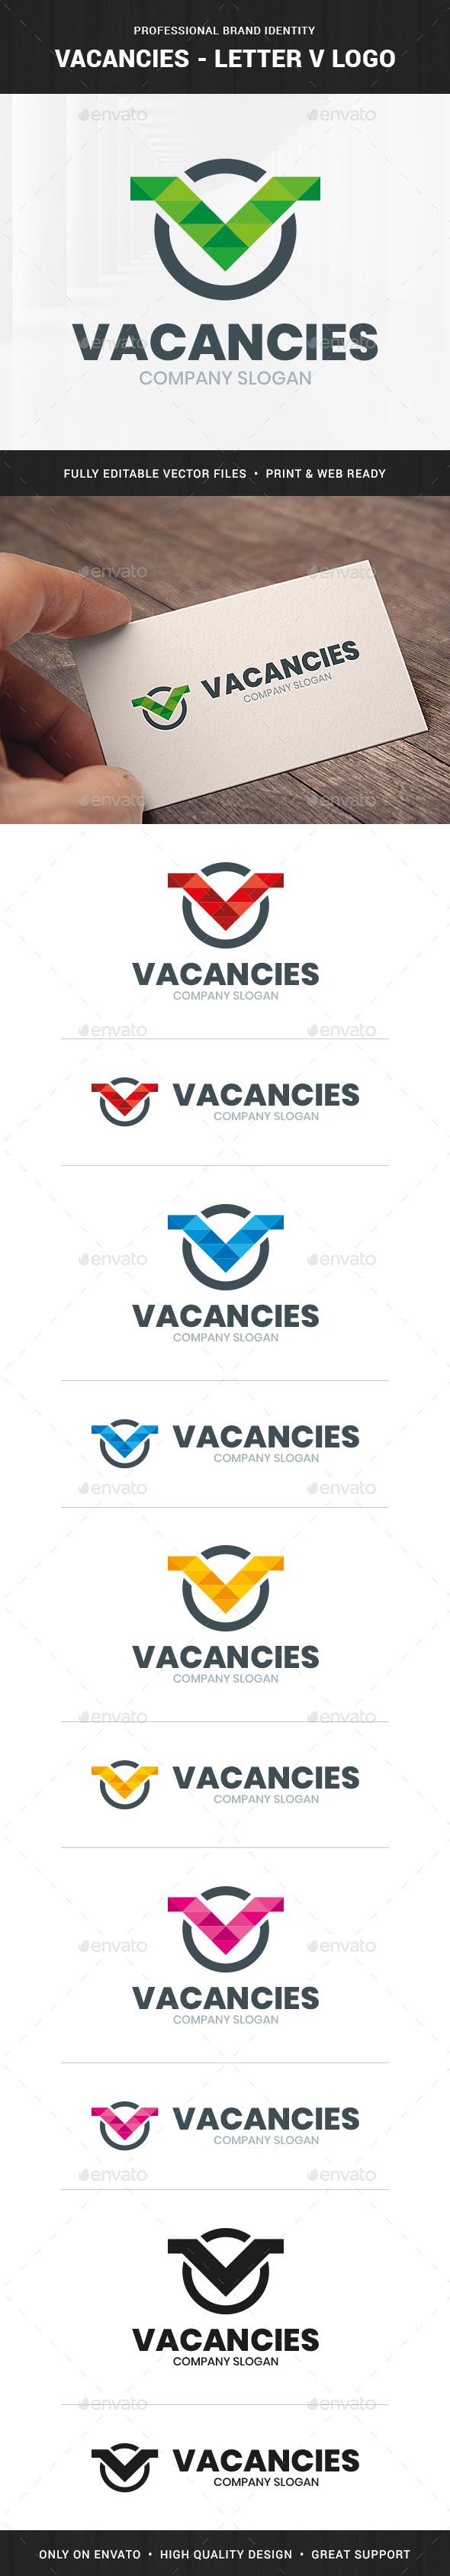 Vacancies - Letter V Logo Template